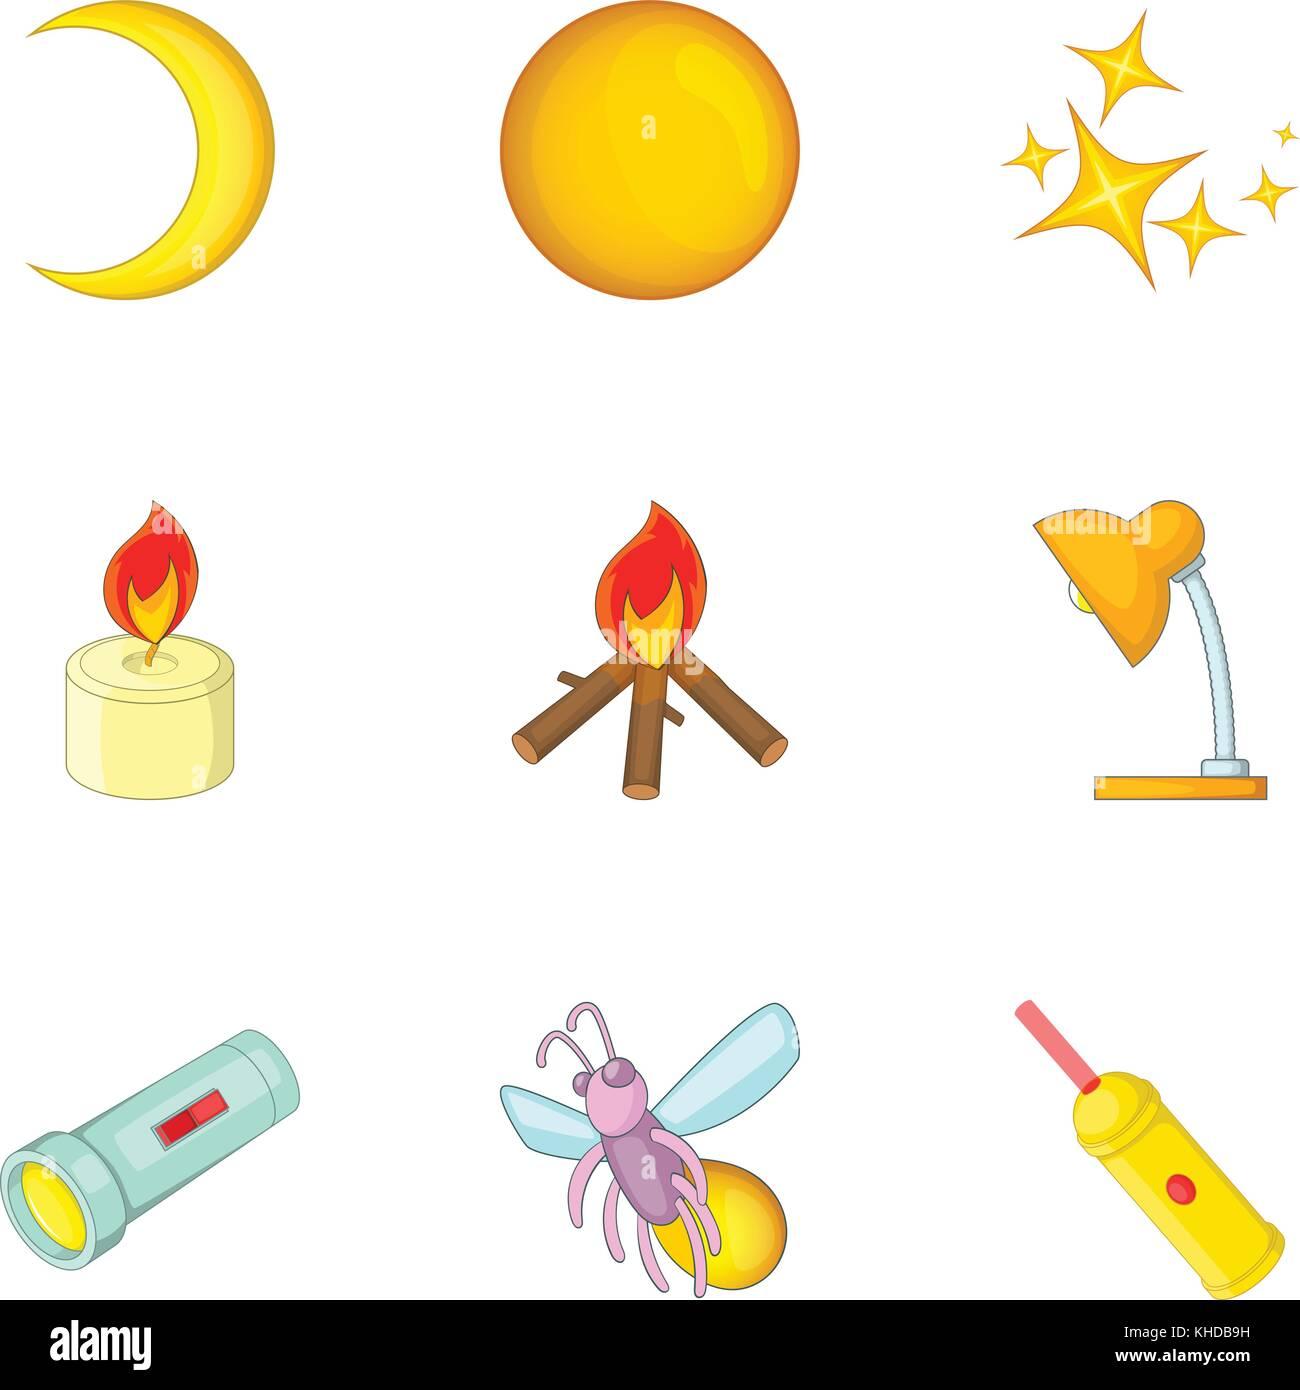 Light Source Icons Set Cartoon Style Stock Vector Image